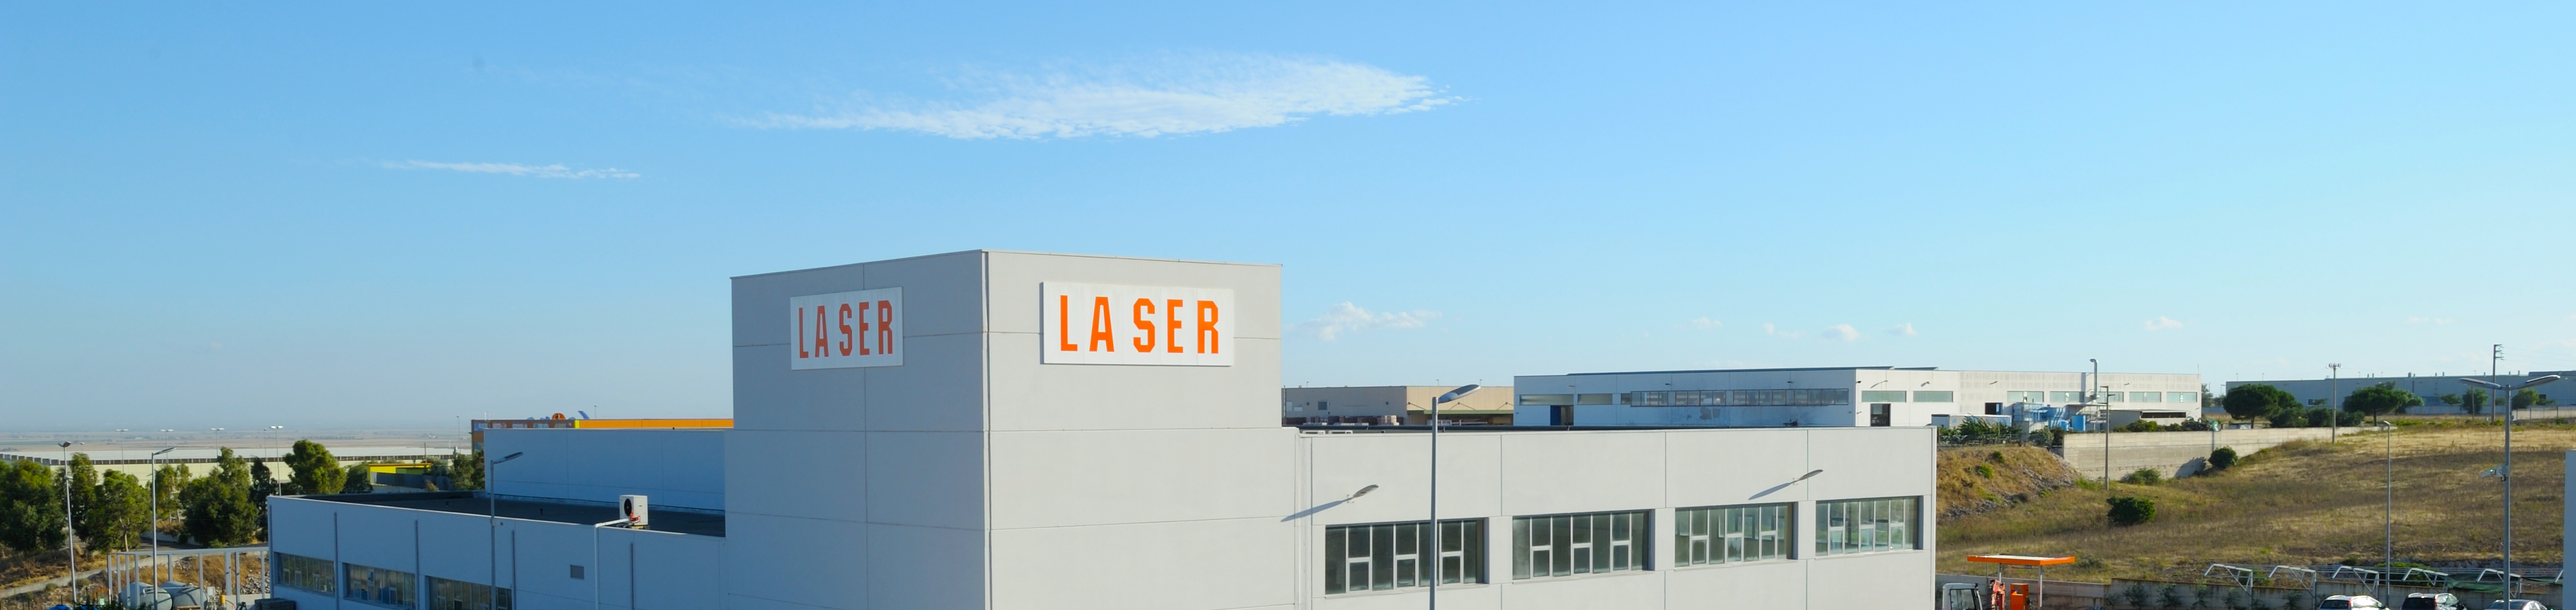 laser_hp_slider_1